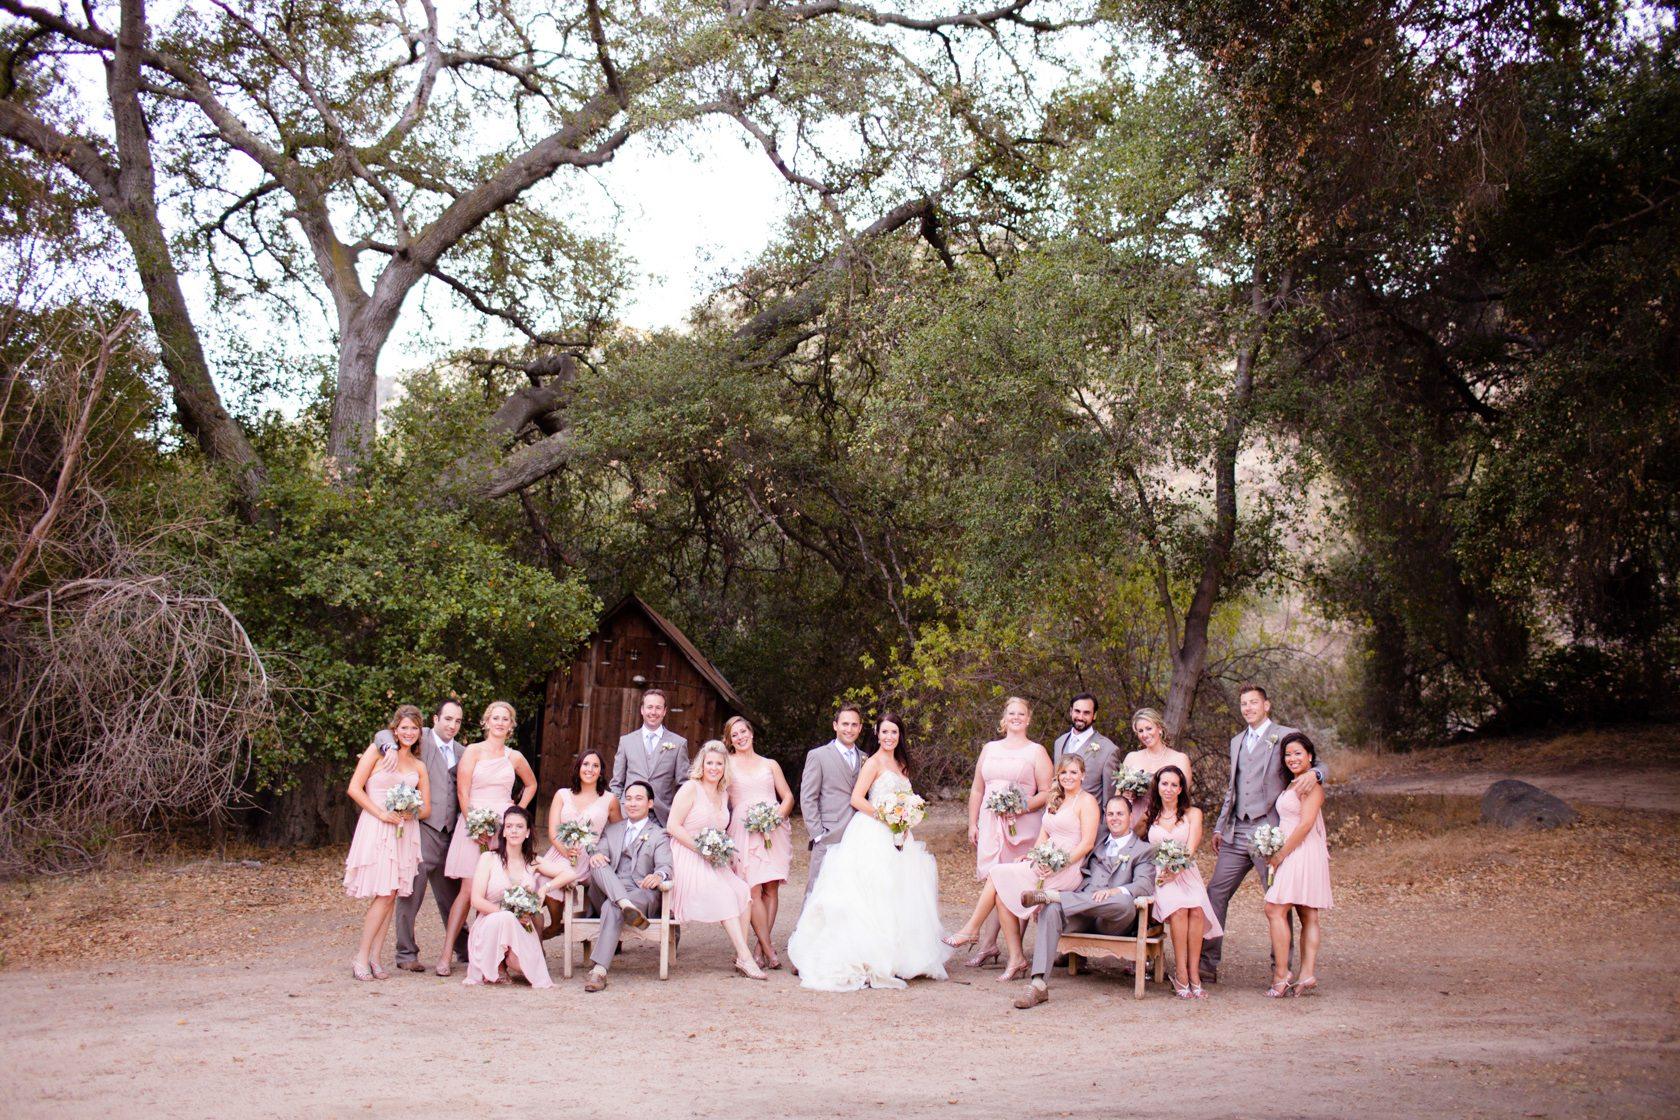 Temecula_Creek_Inn_Wedding_107.jpg